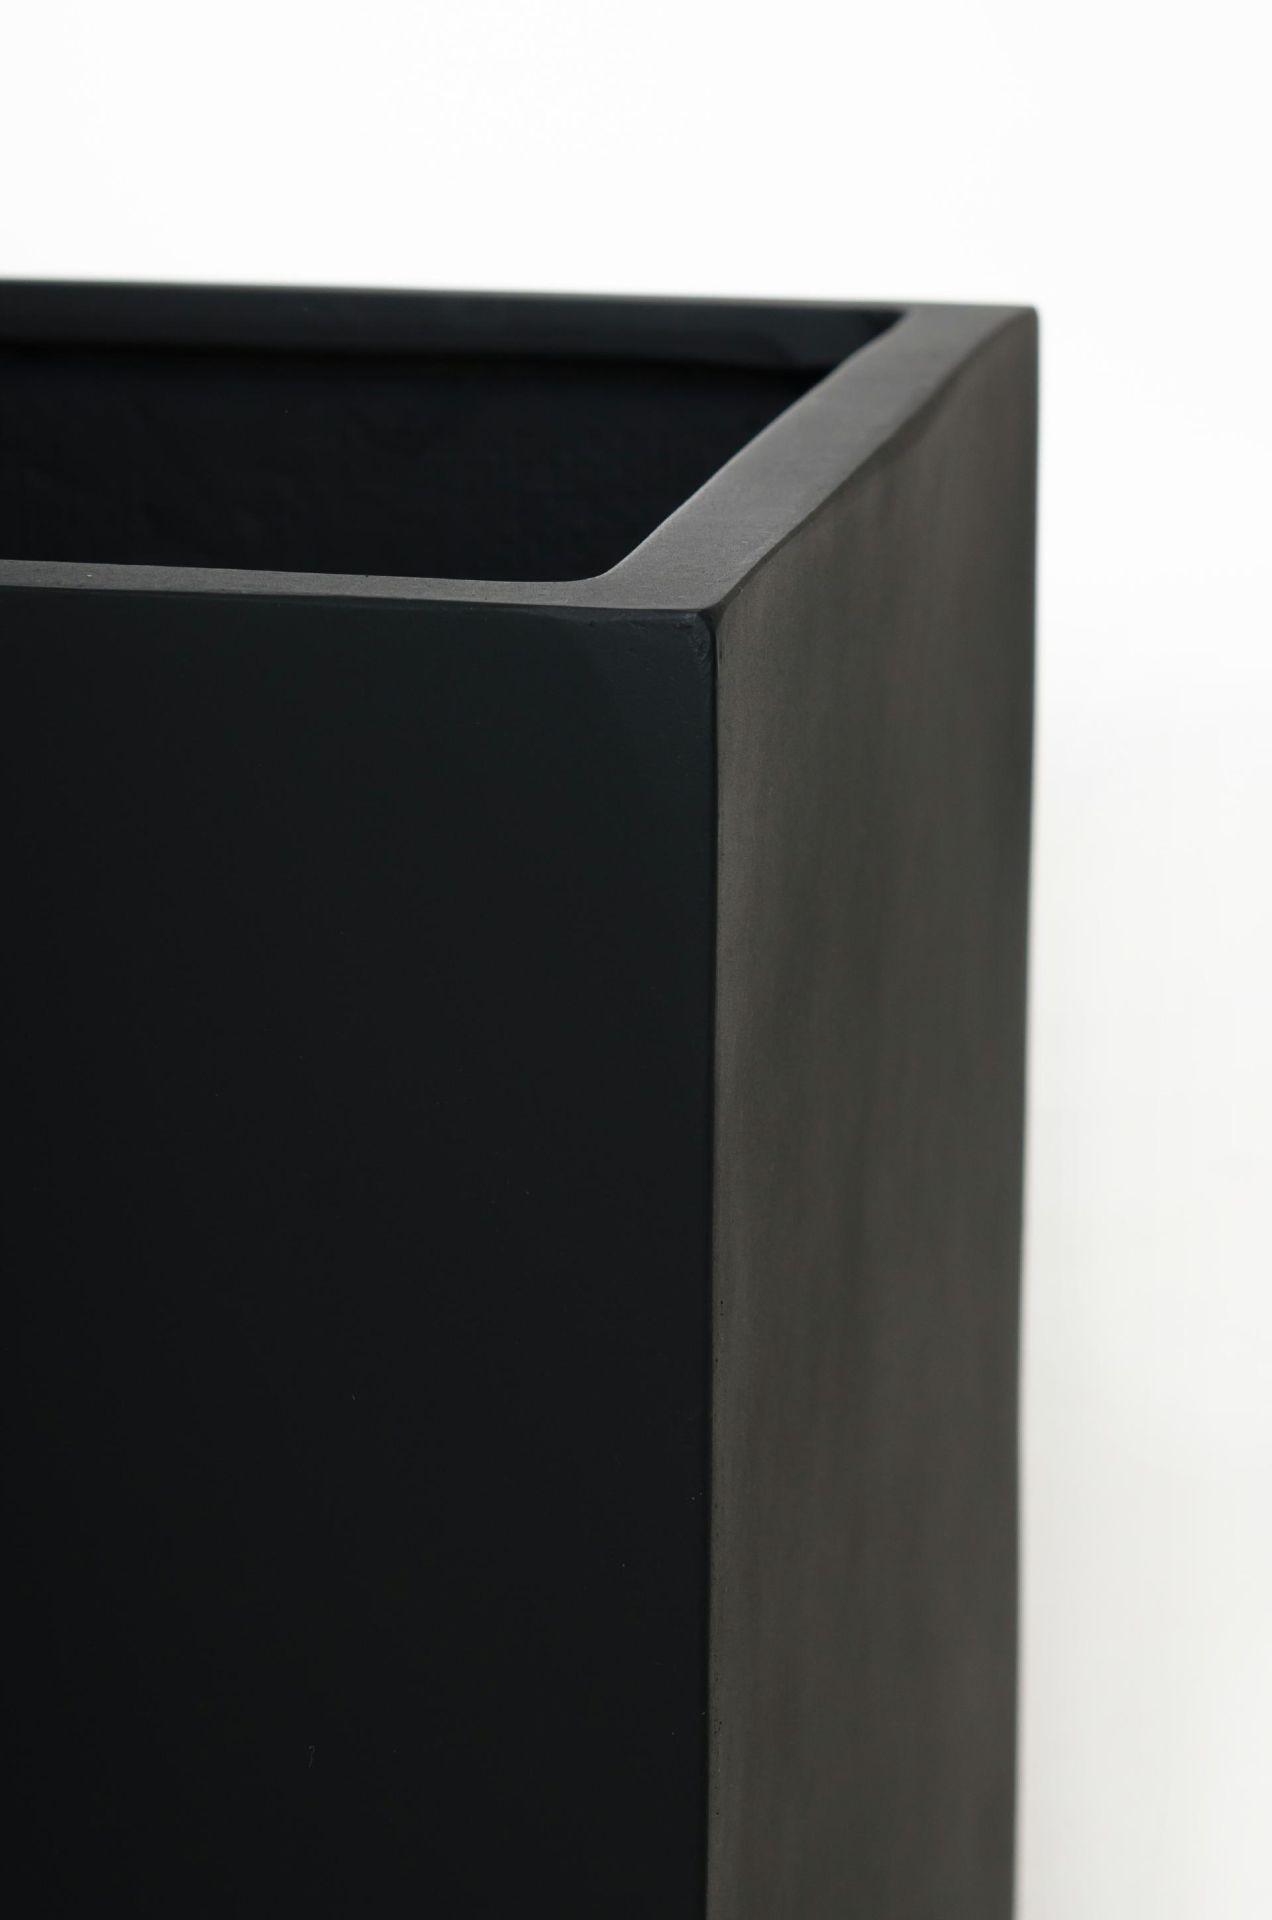 vivanno blumenk bel pflanztrog fiberglas maxi anthrazit 80cm ae trade online. Black Bedroom Furniture Sets. Home Design Ideas